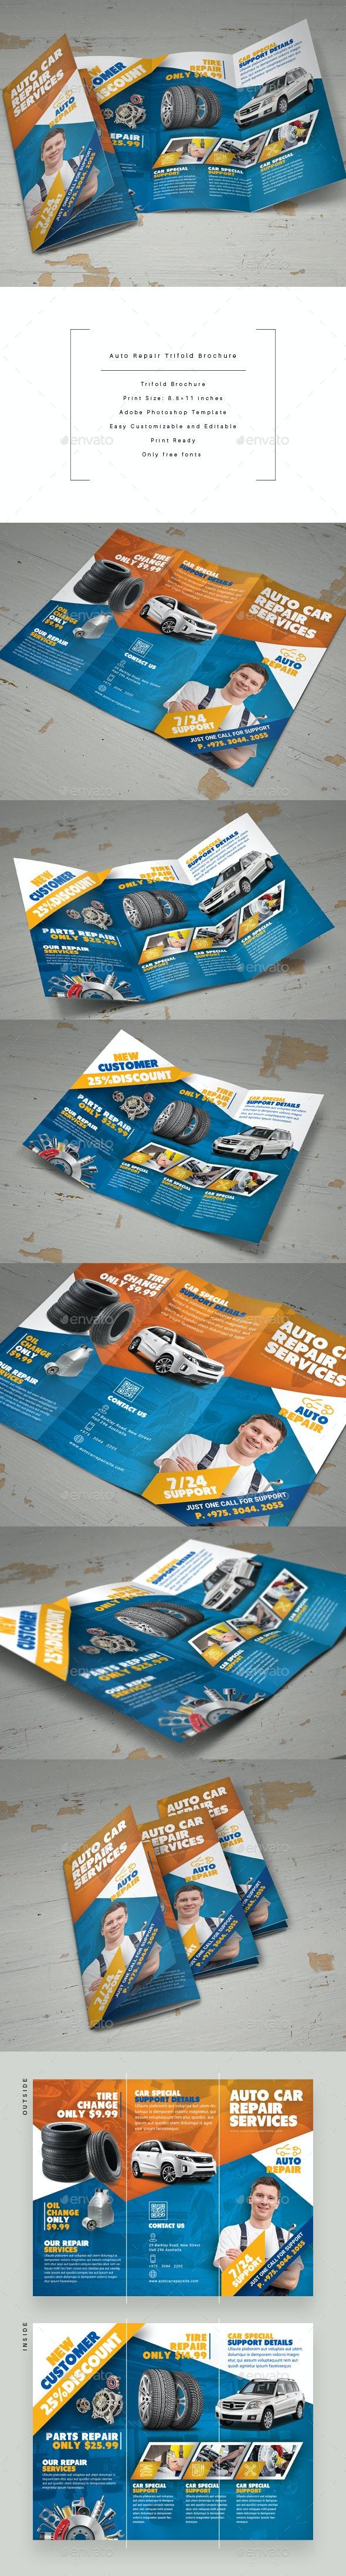 Auto Repair Trifold Brochure - Corporate Brochures